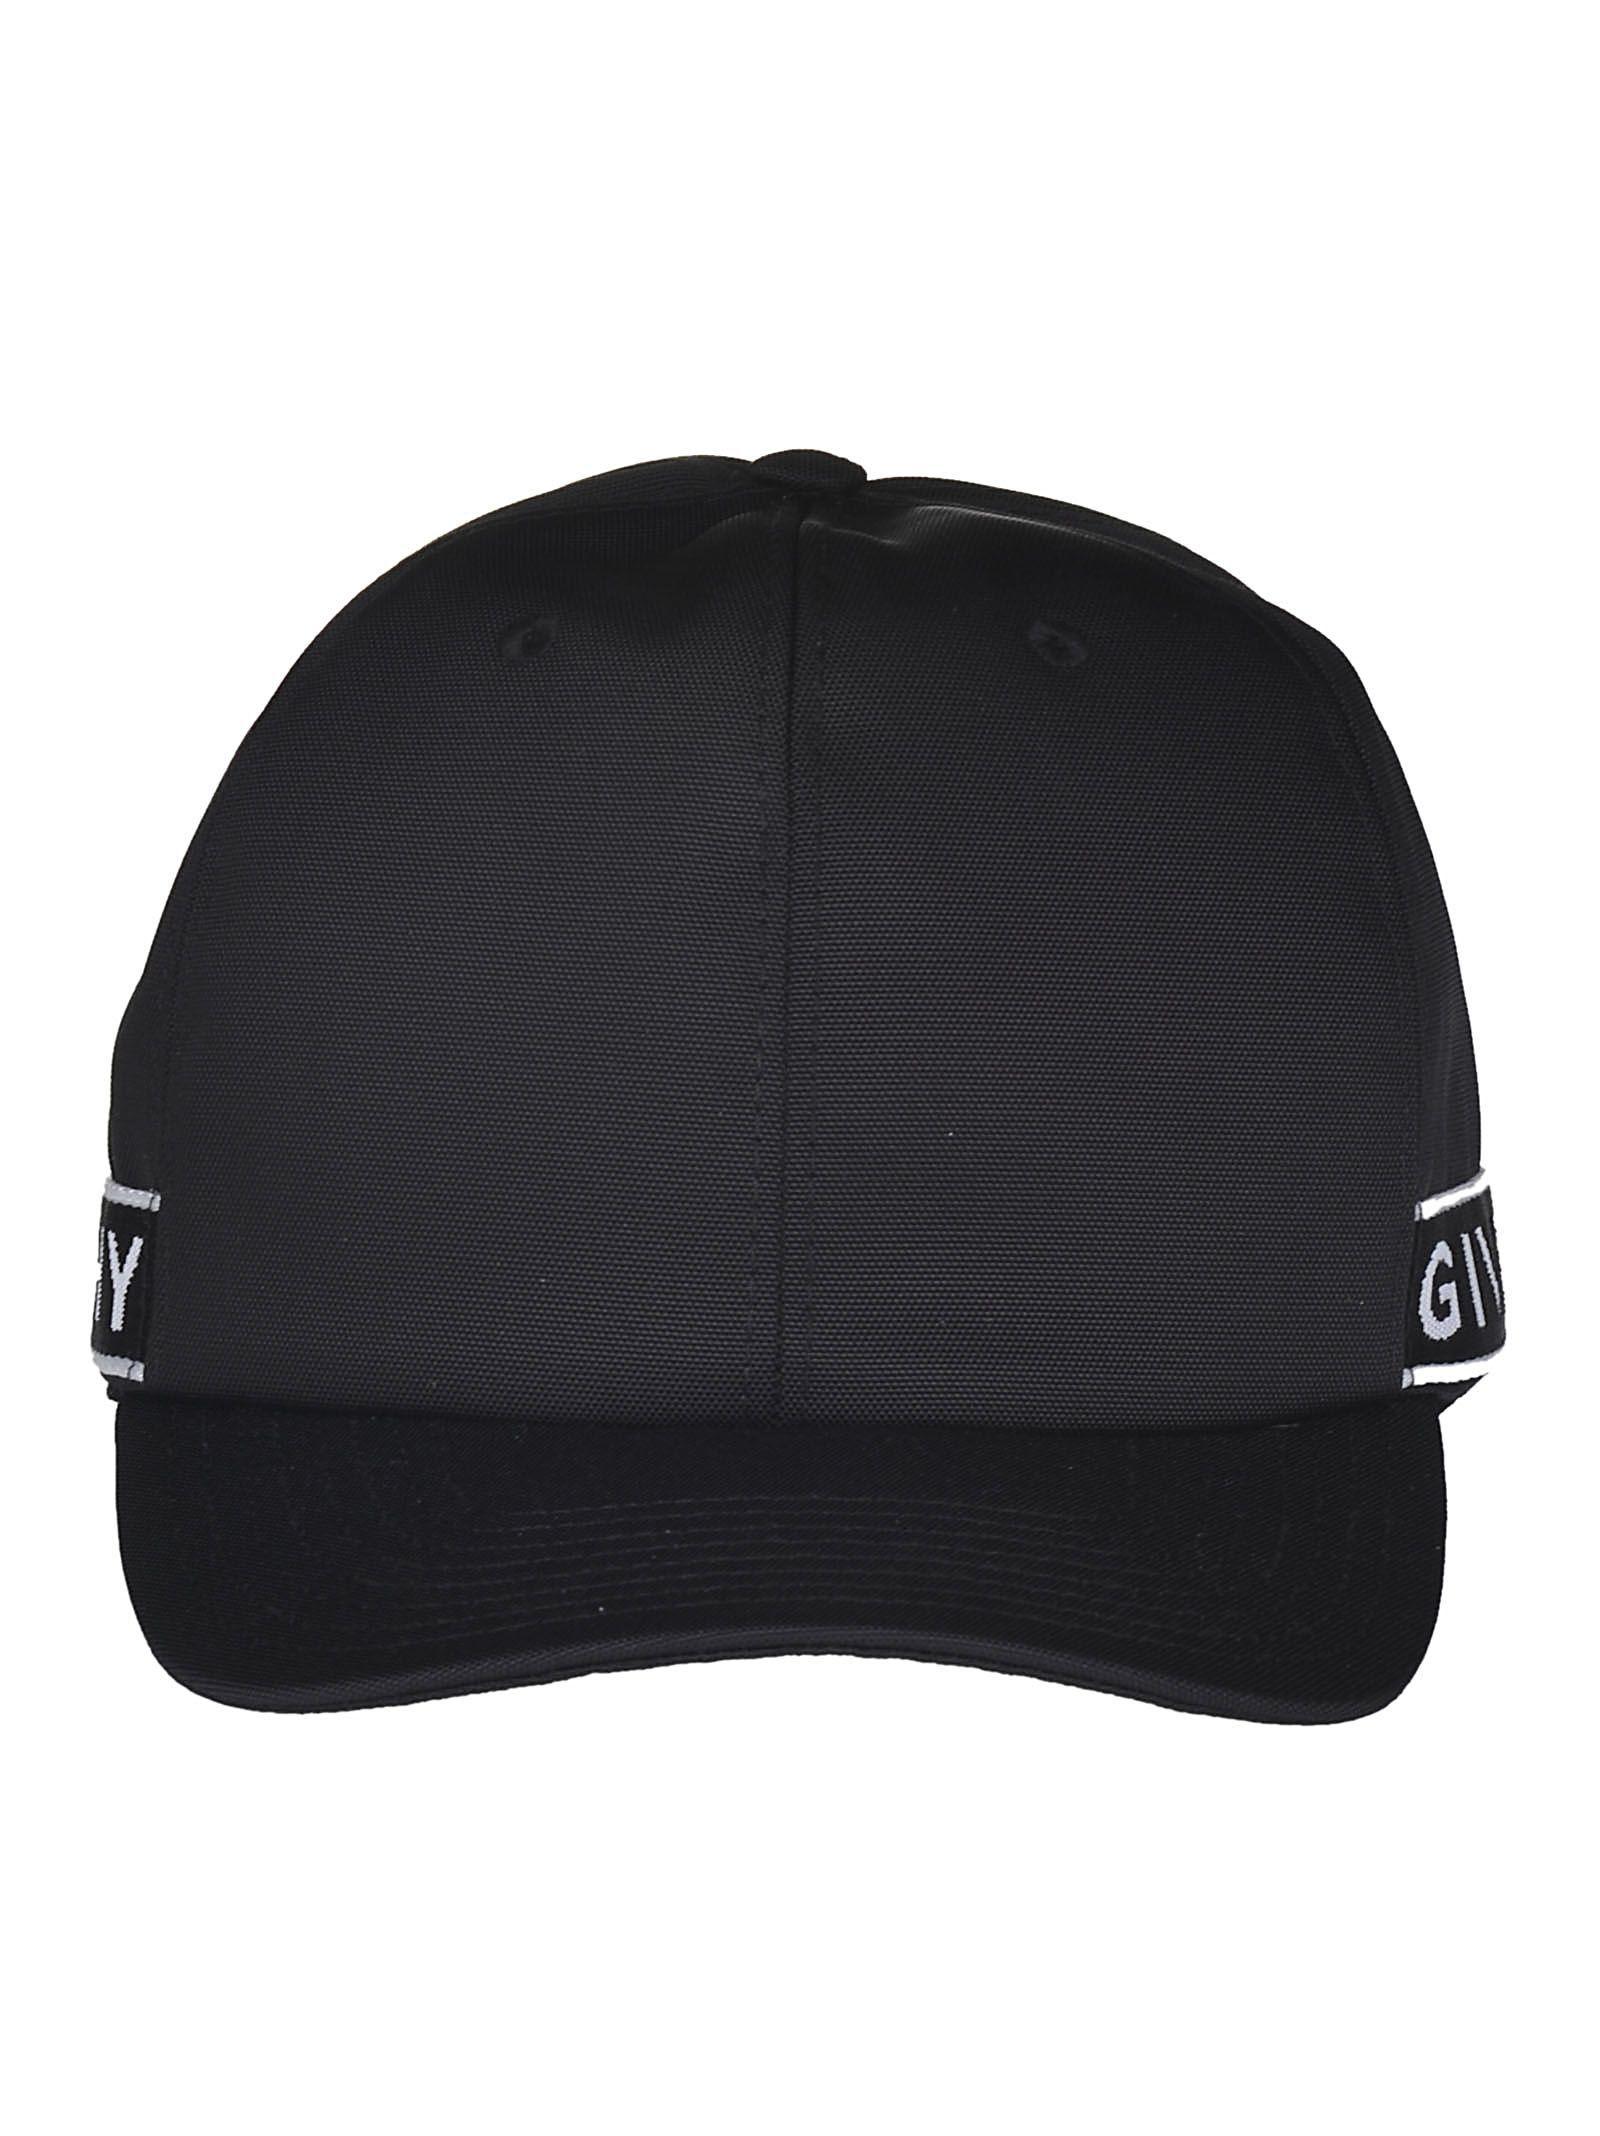 fb3b4d1e9ab GIVENCHY 4G SIDE STRAP CAP.  givenchy